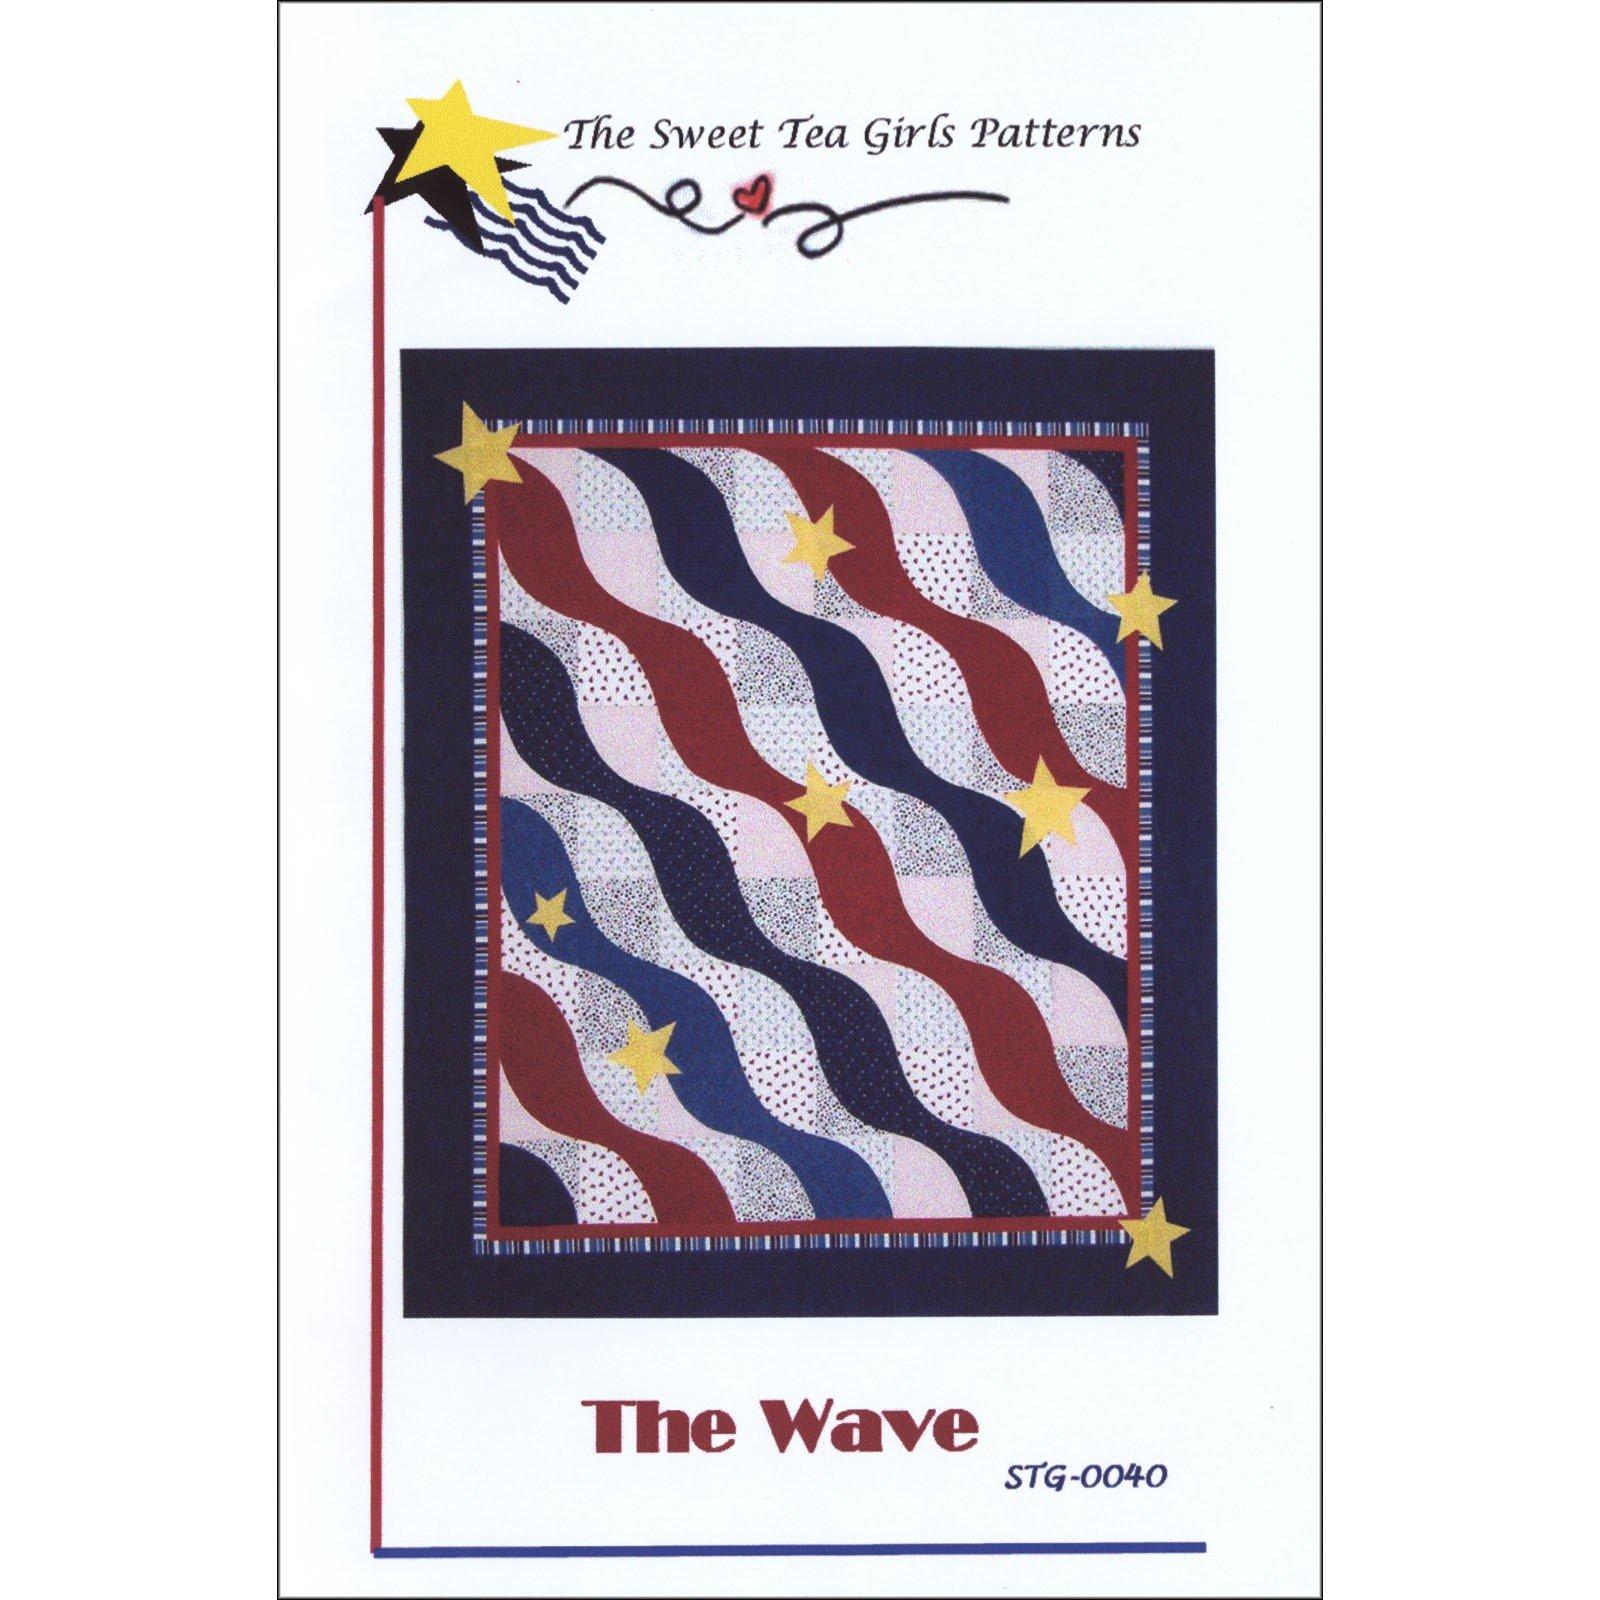 The Wave<br/>Sweet Tea Girls